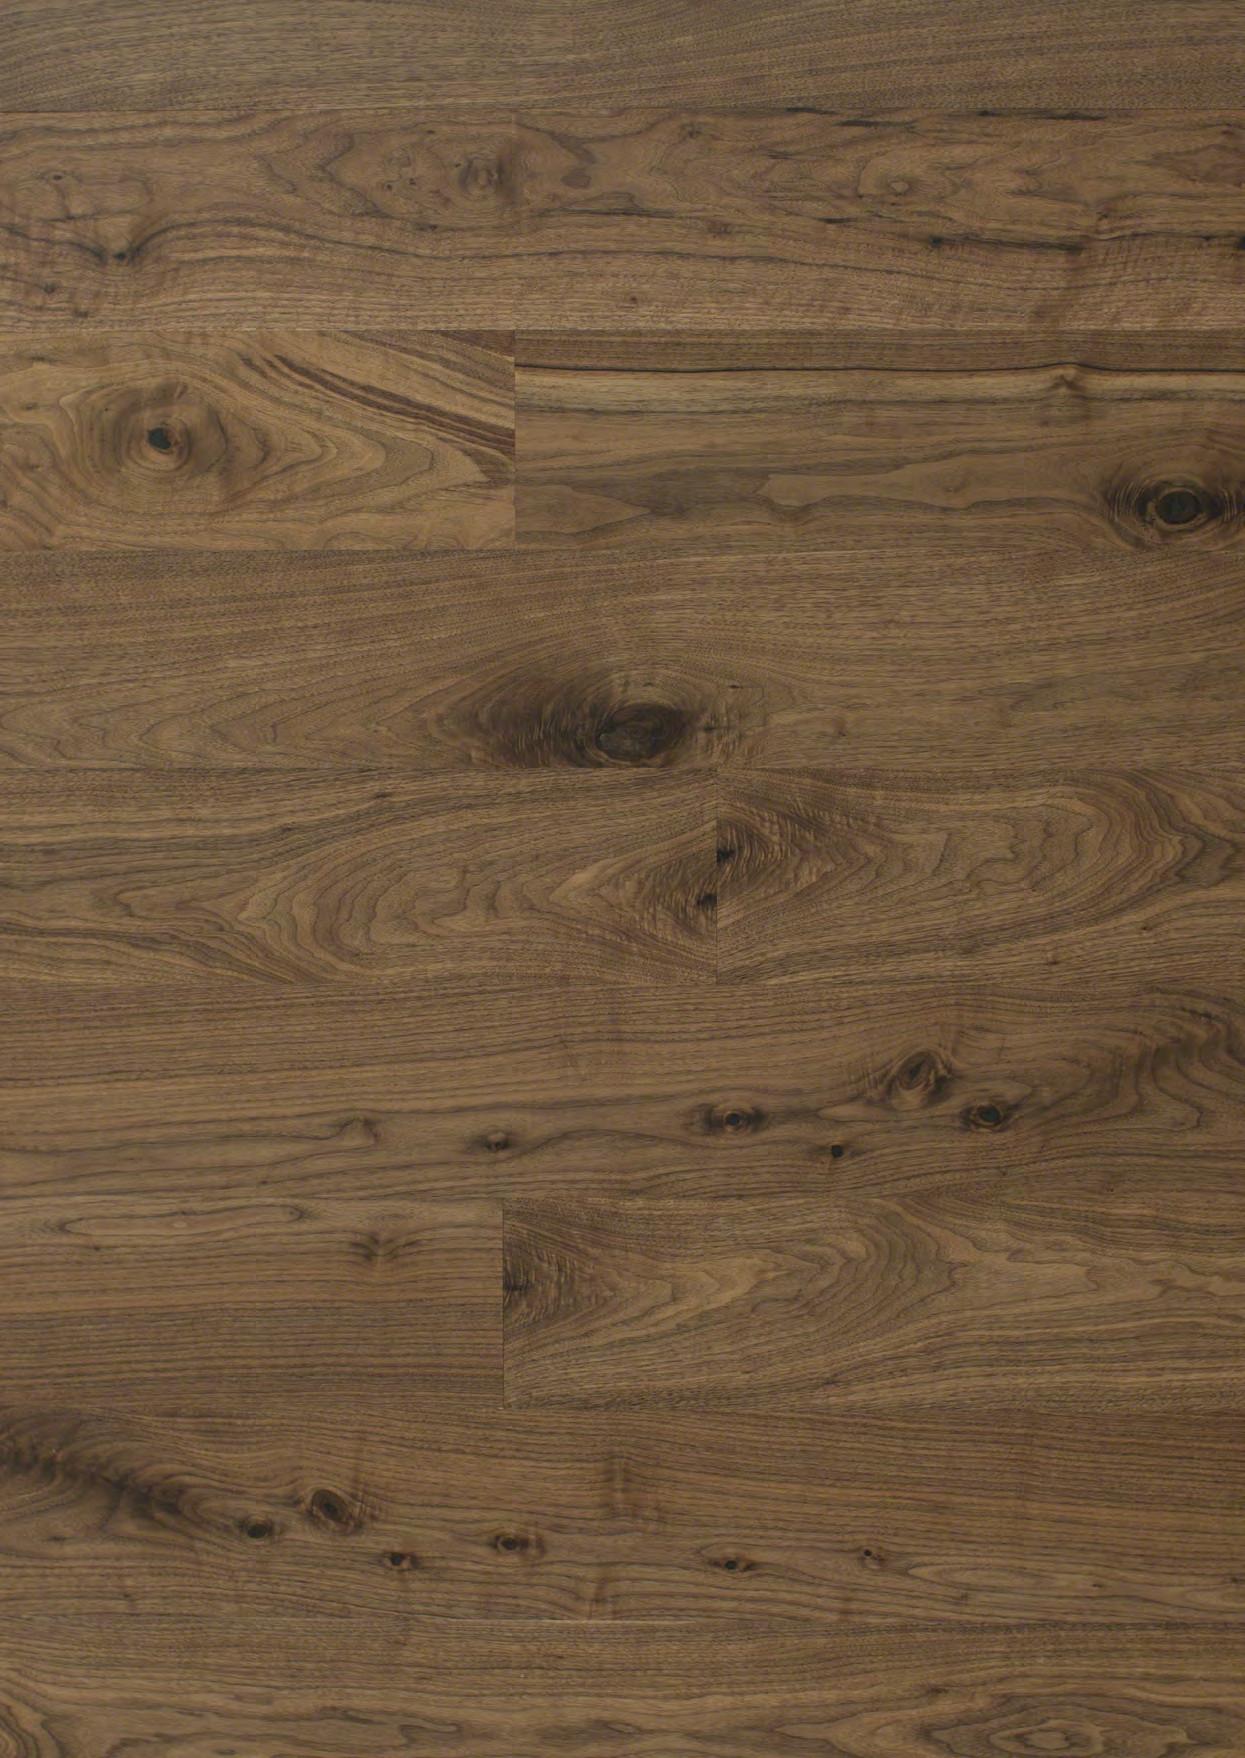 homerwood hardwood flooring prices of brooks bros for hardwood flooring 2016 17 price list pdf pertaining to tri layer walnut